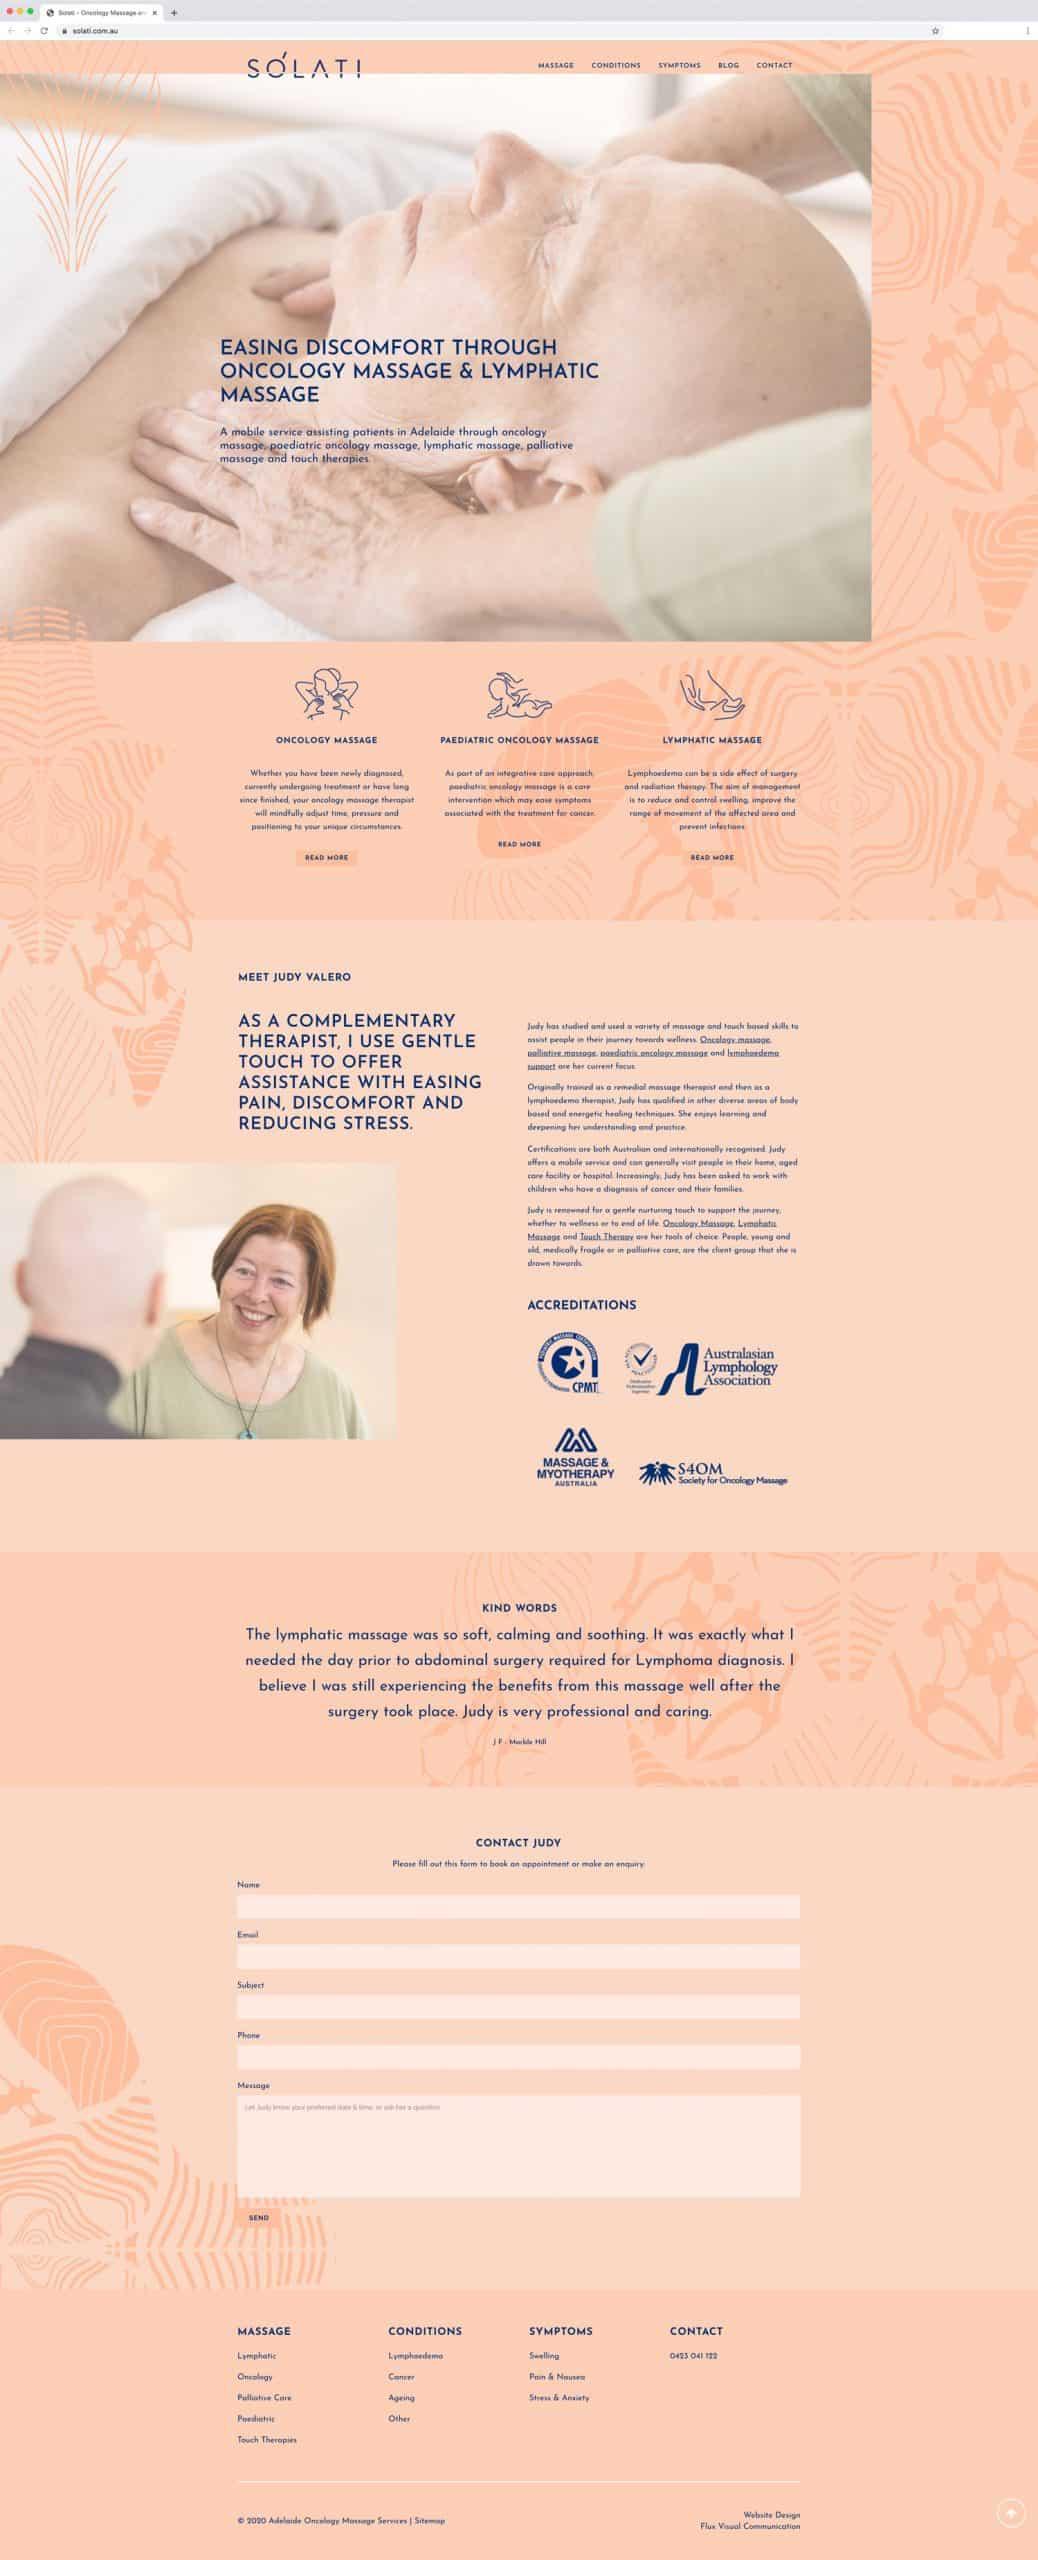 Solati WordPress website homepage design by Flux Visual Communication, Adelaide